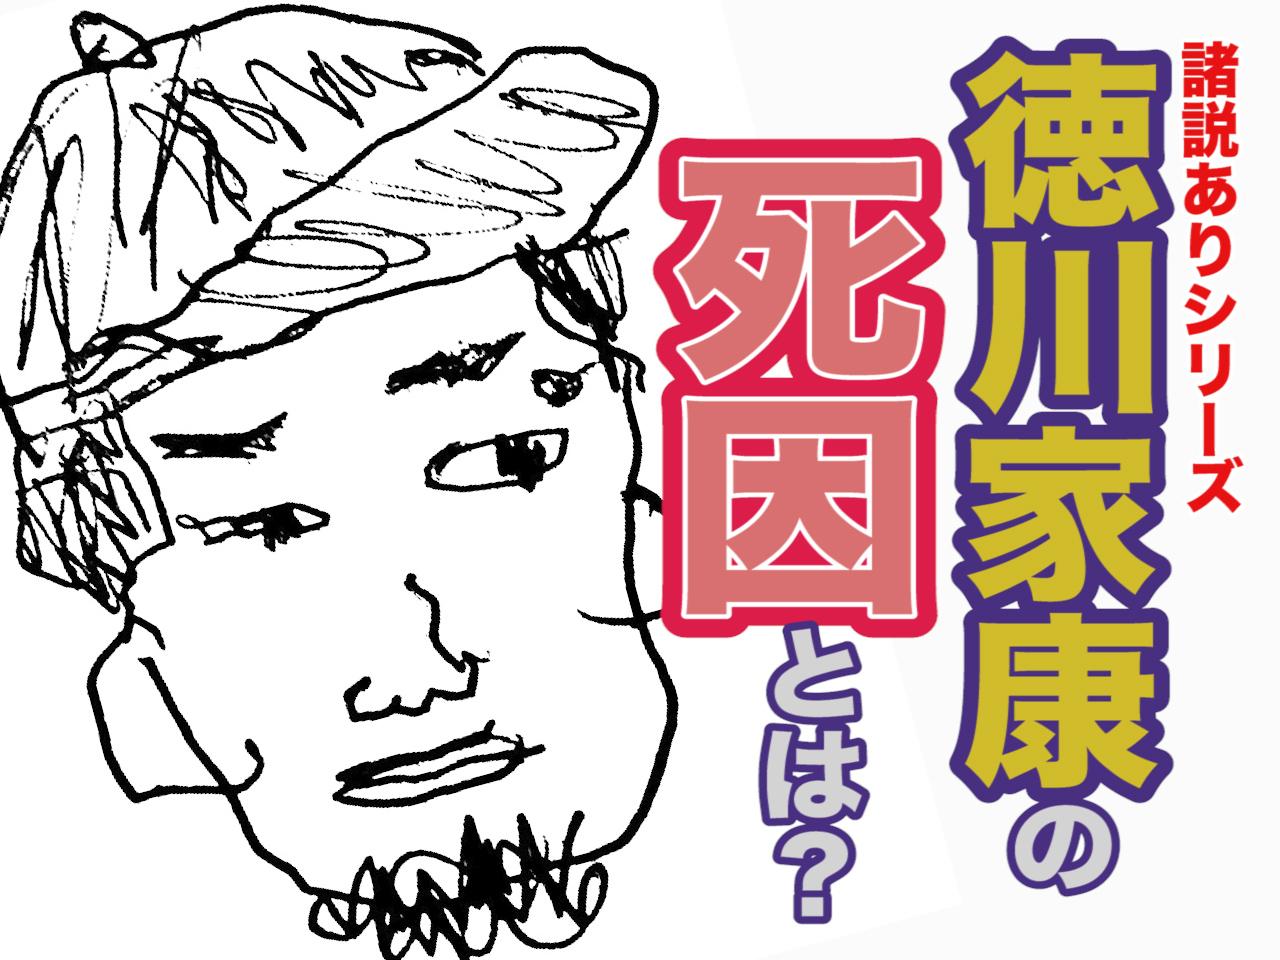 徳川家康 死因 伝説 諸説あり